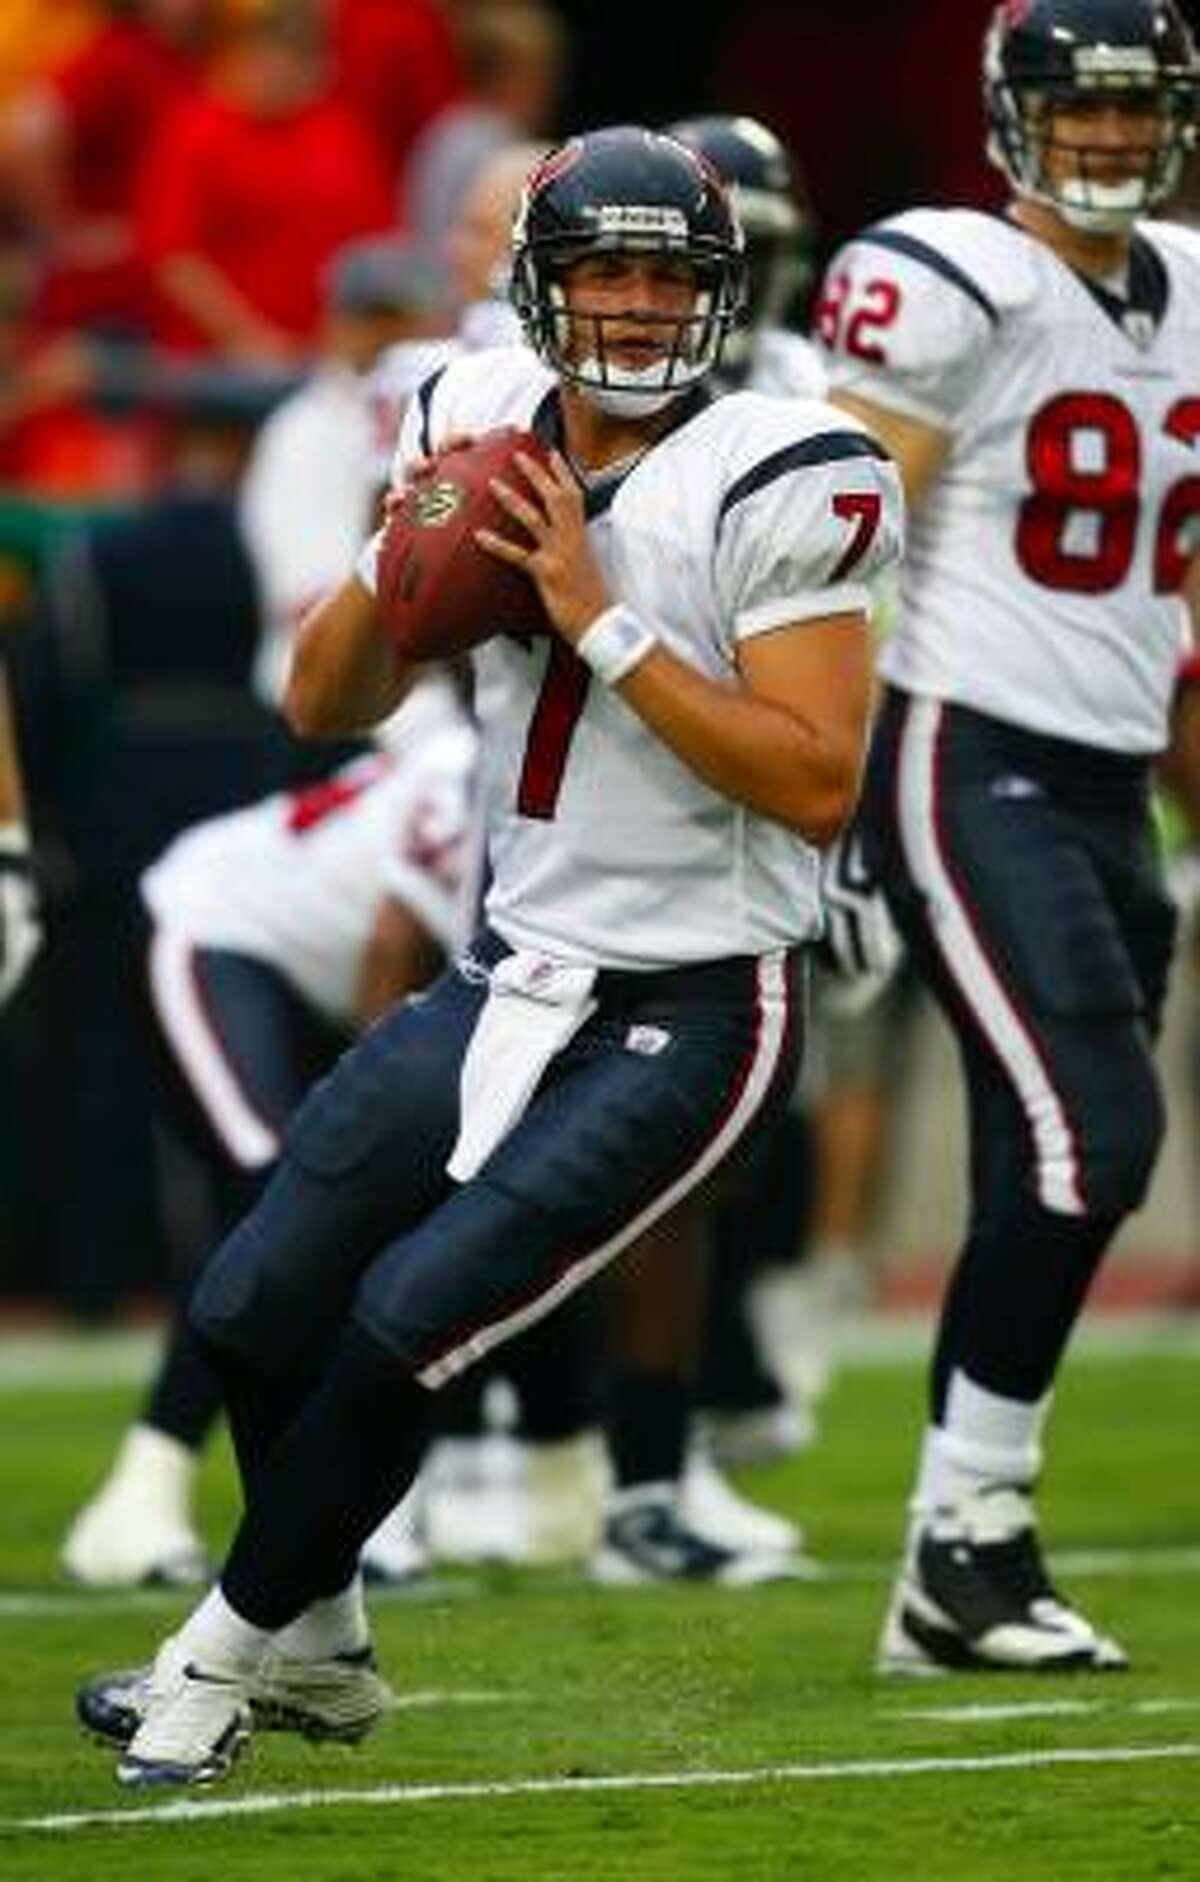 Texans backup quarterback Dan Orlovsky warms up prior to the preseason game against the Kansas City Chiefs at Arrowhead Stadium.